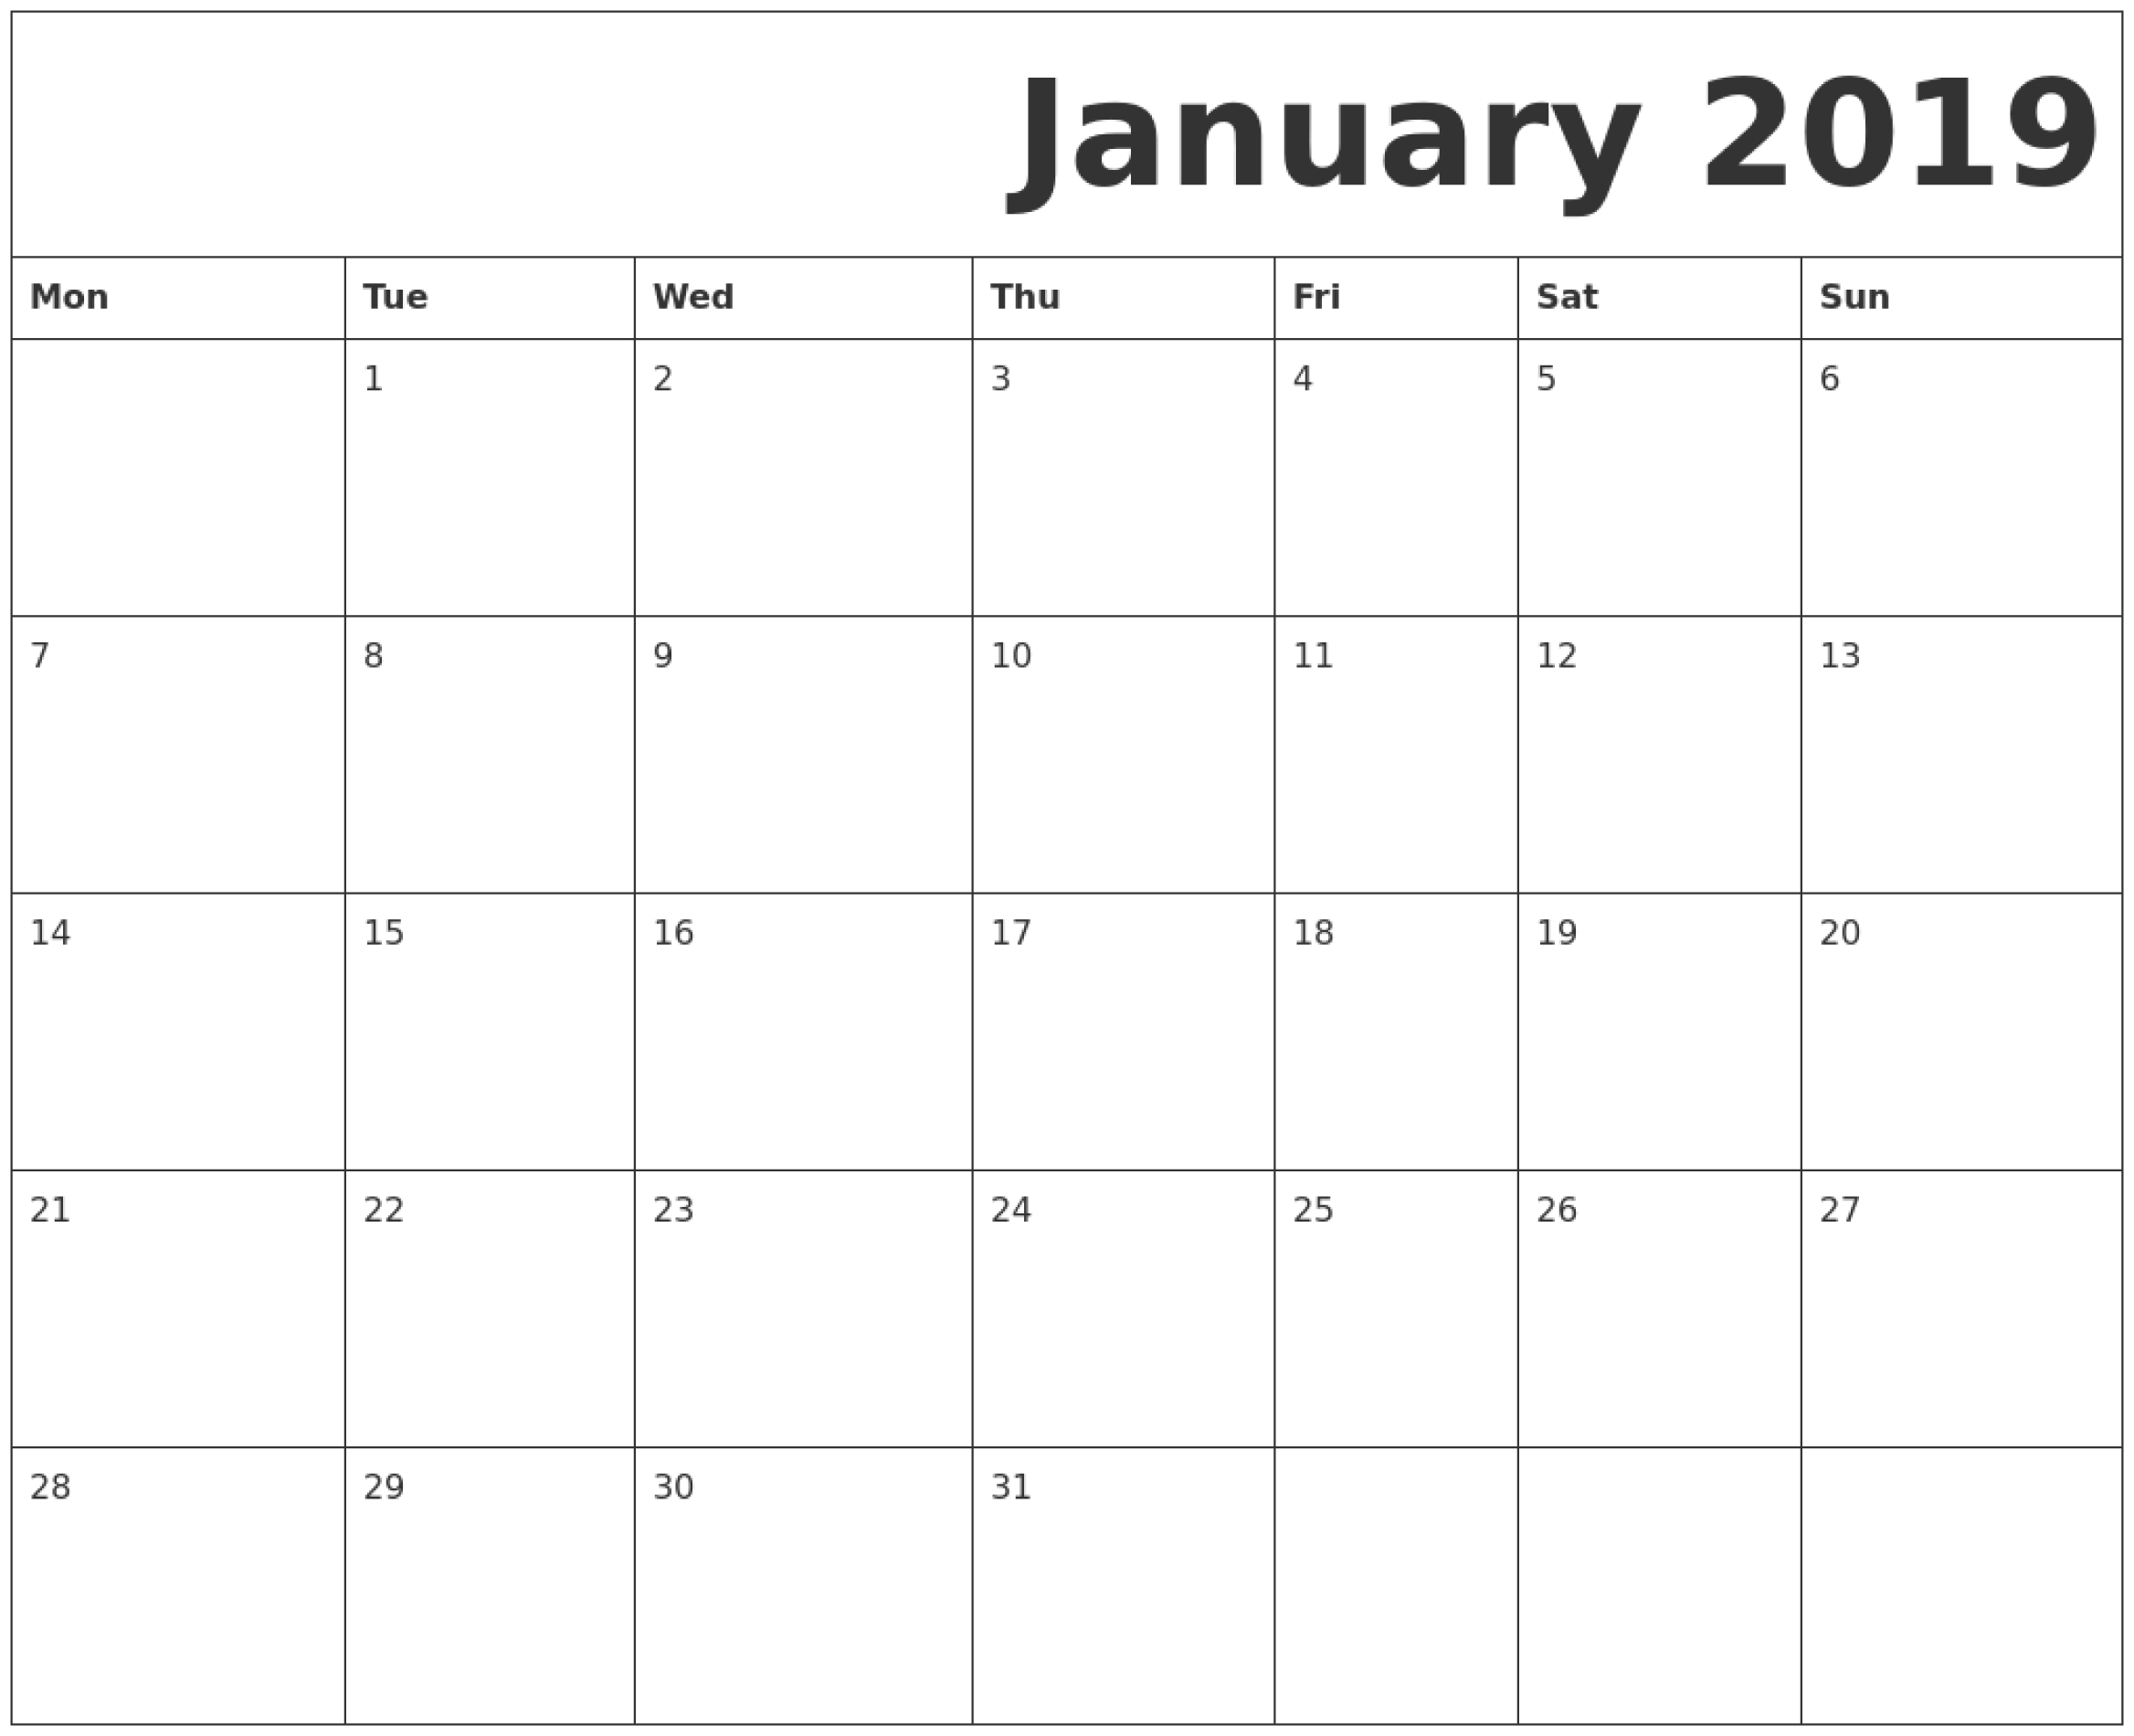 January 2019 Printable Calendar Monday Start. | June Free Monthly Calendars Starting On Monday